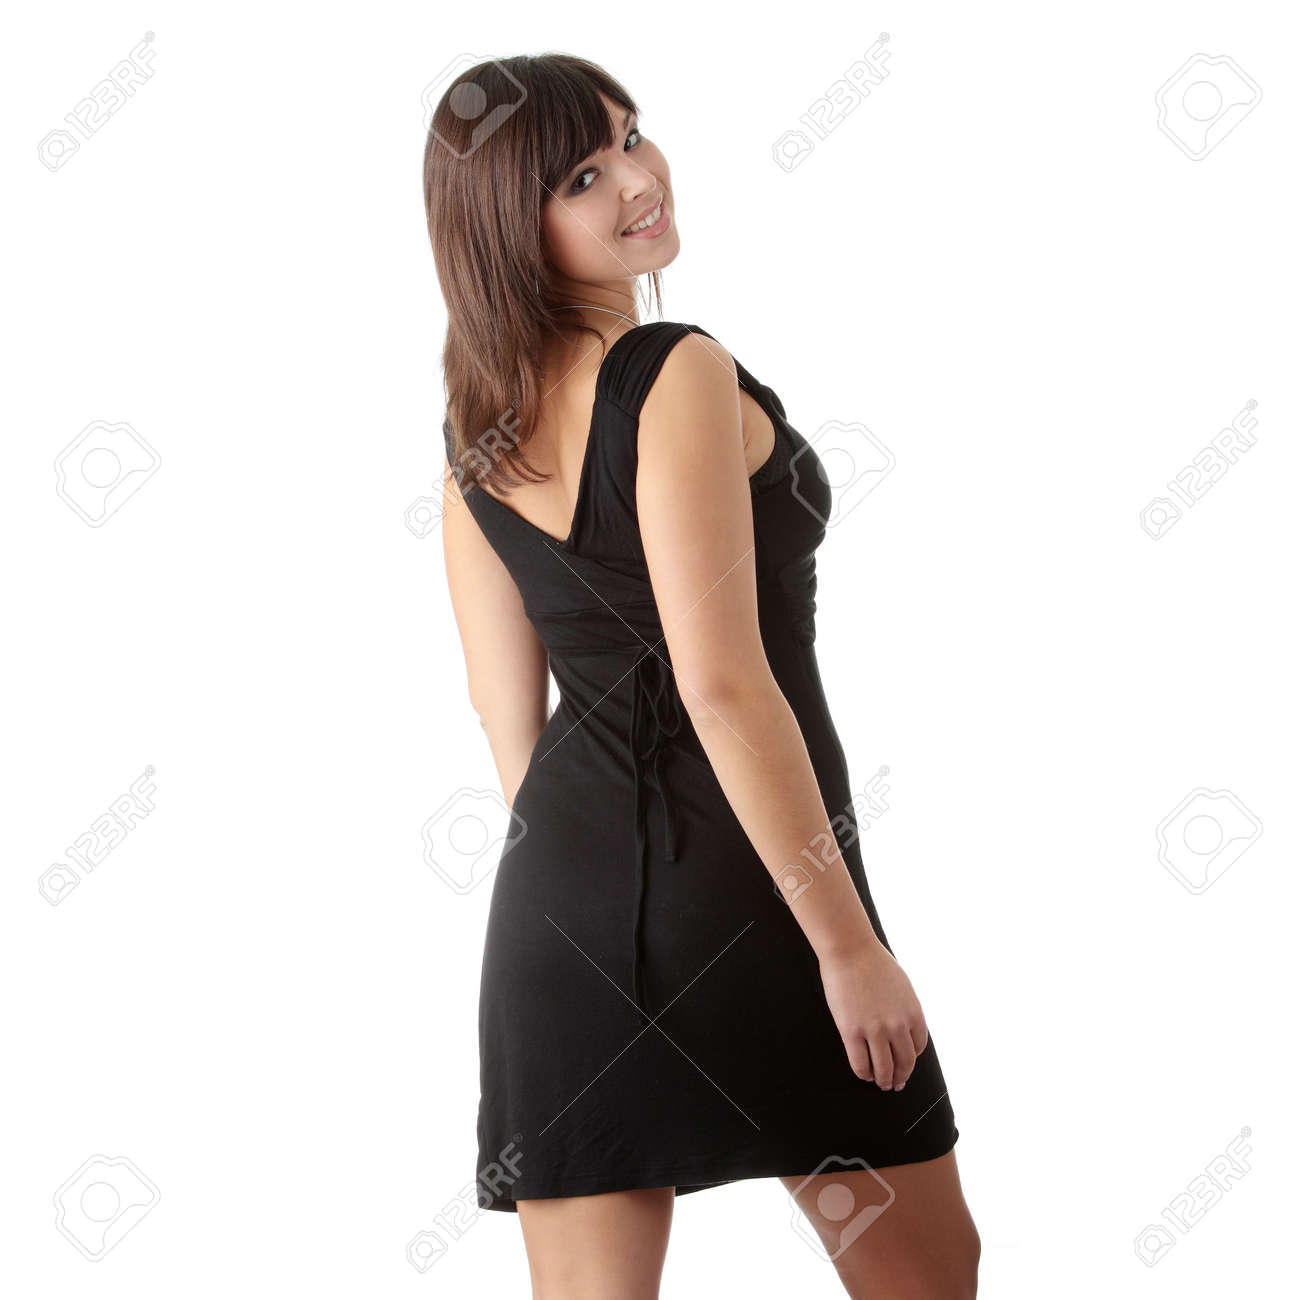 922ae7ecf63d5a Mooie jonge vrouw in zwarte jurk geïsoleerd op wit Stockfoto - 24535674